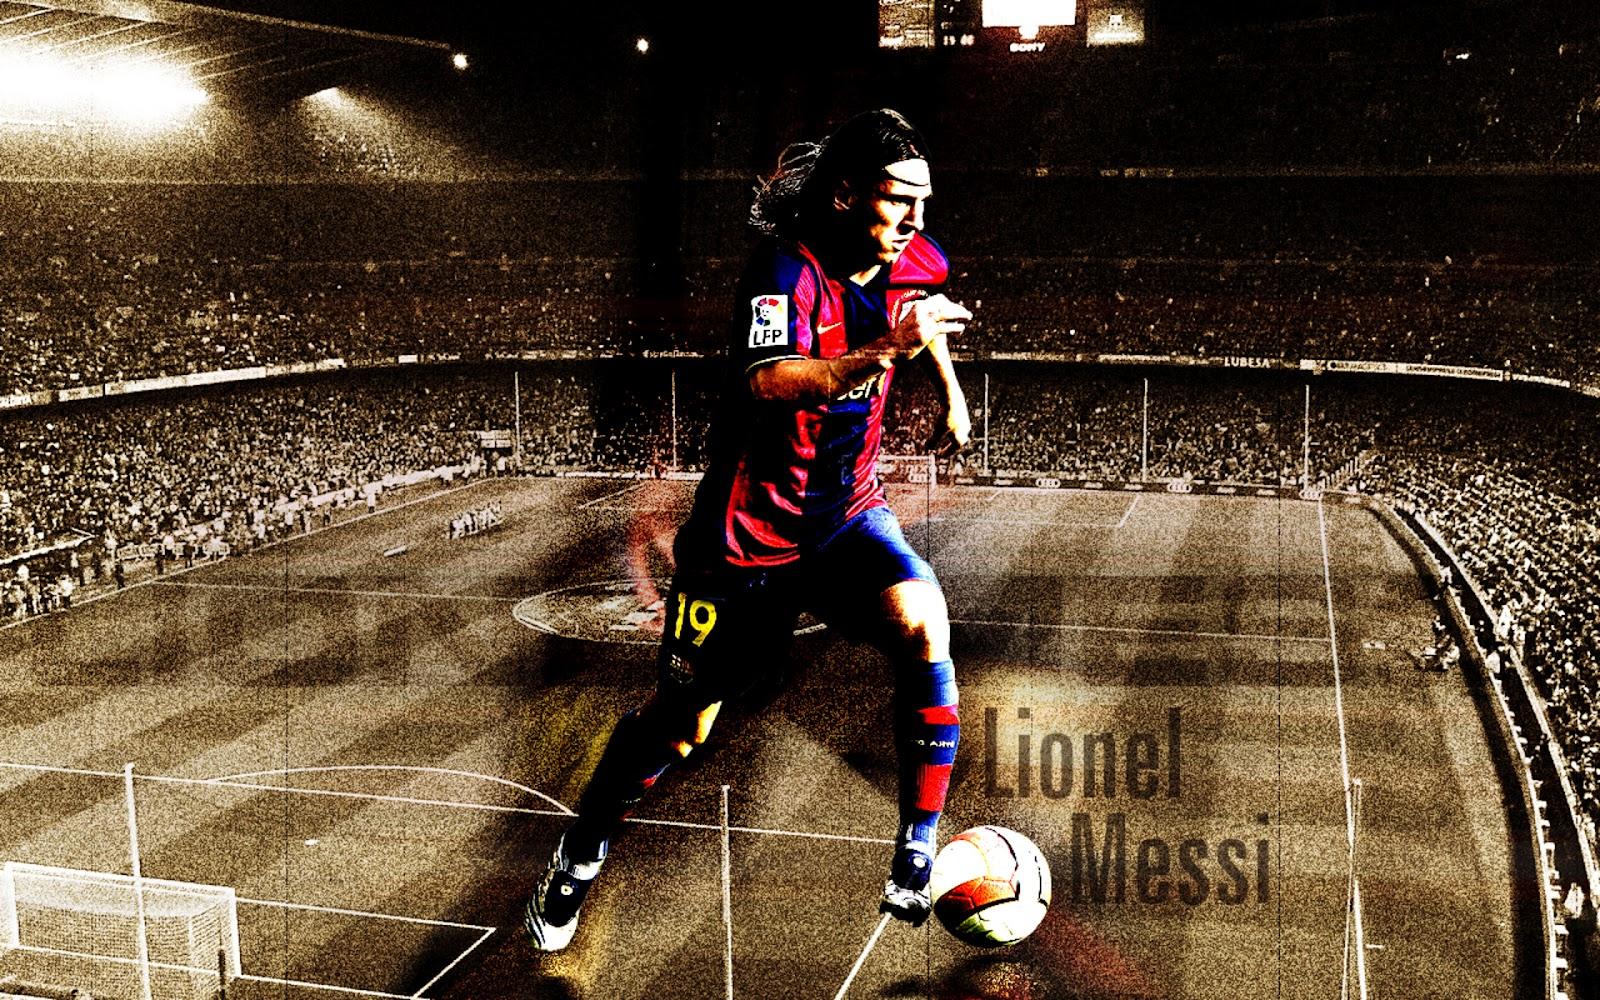 http://2.bp.blogspot.com/-v7BrmZB5FiI/T6cFR_7OYuI/AAAAAAAAJVc/k7G4h9FaryE/s1600/Lionel_Messi.jpg